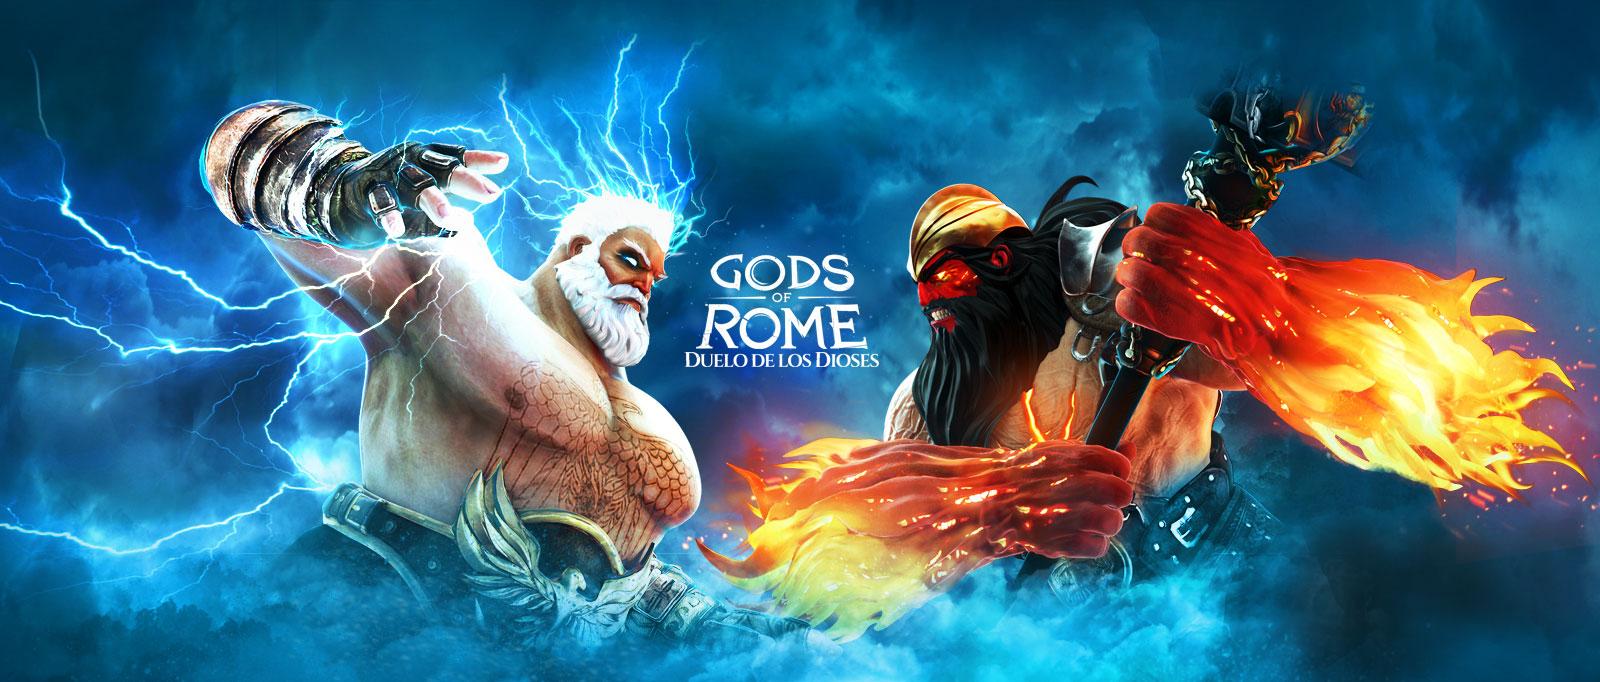 Gods of Rome: Duelo de los Dioses